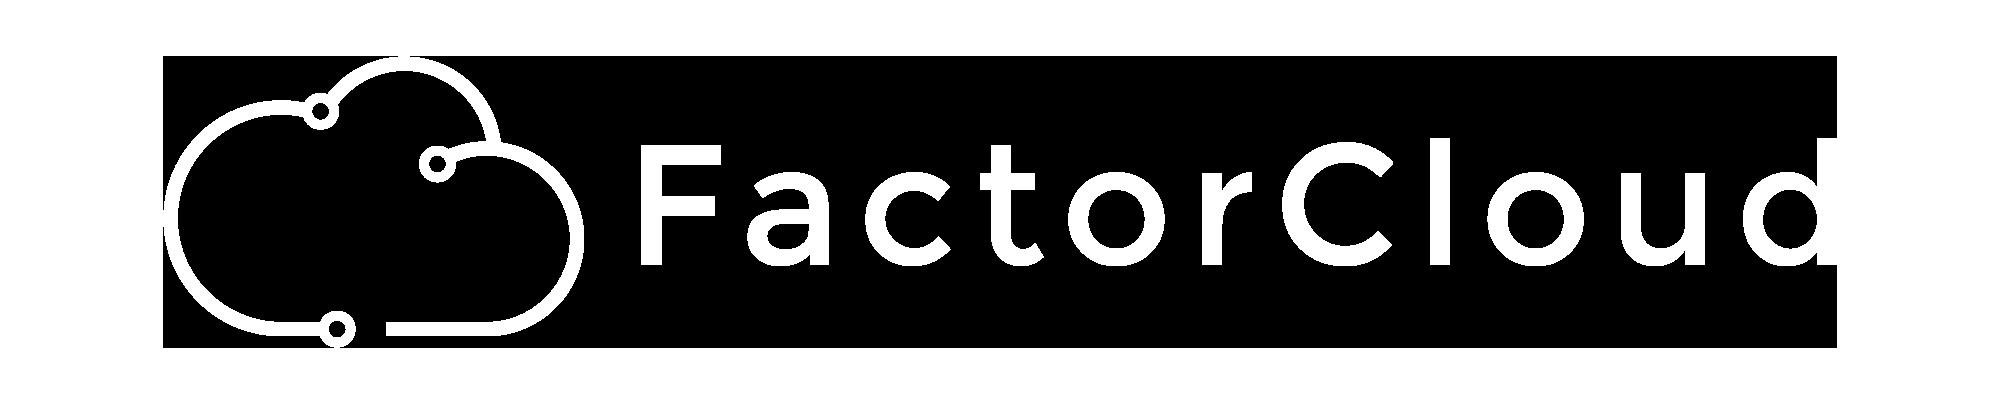 factorcloud